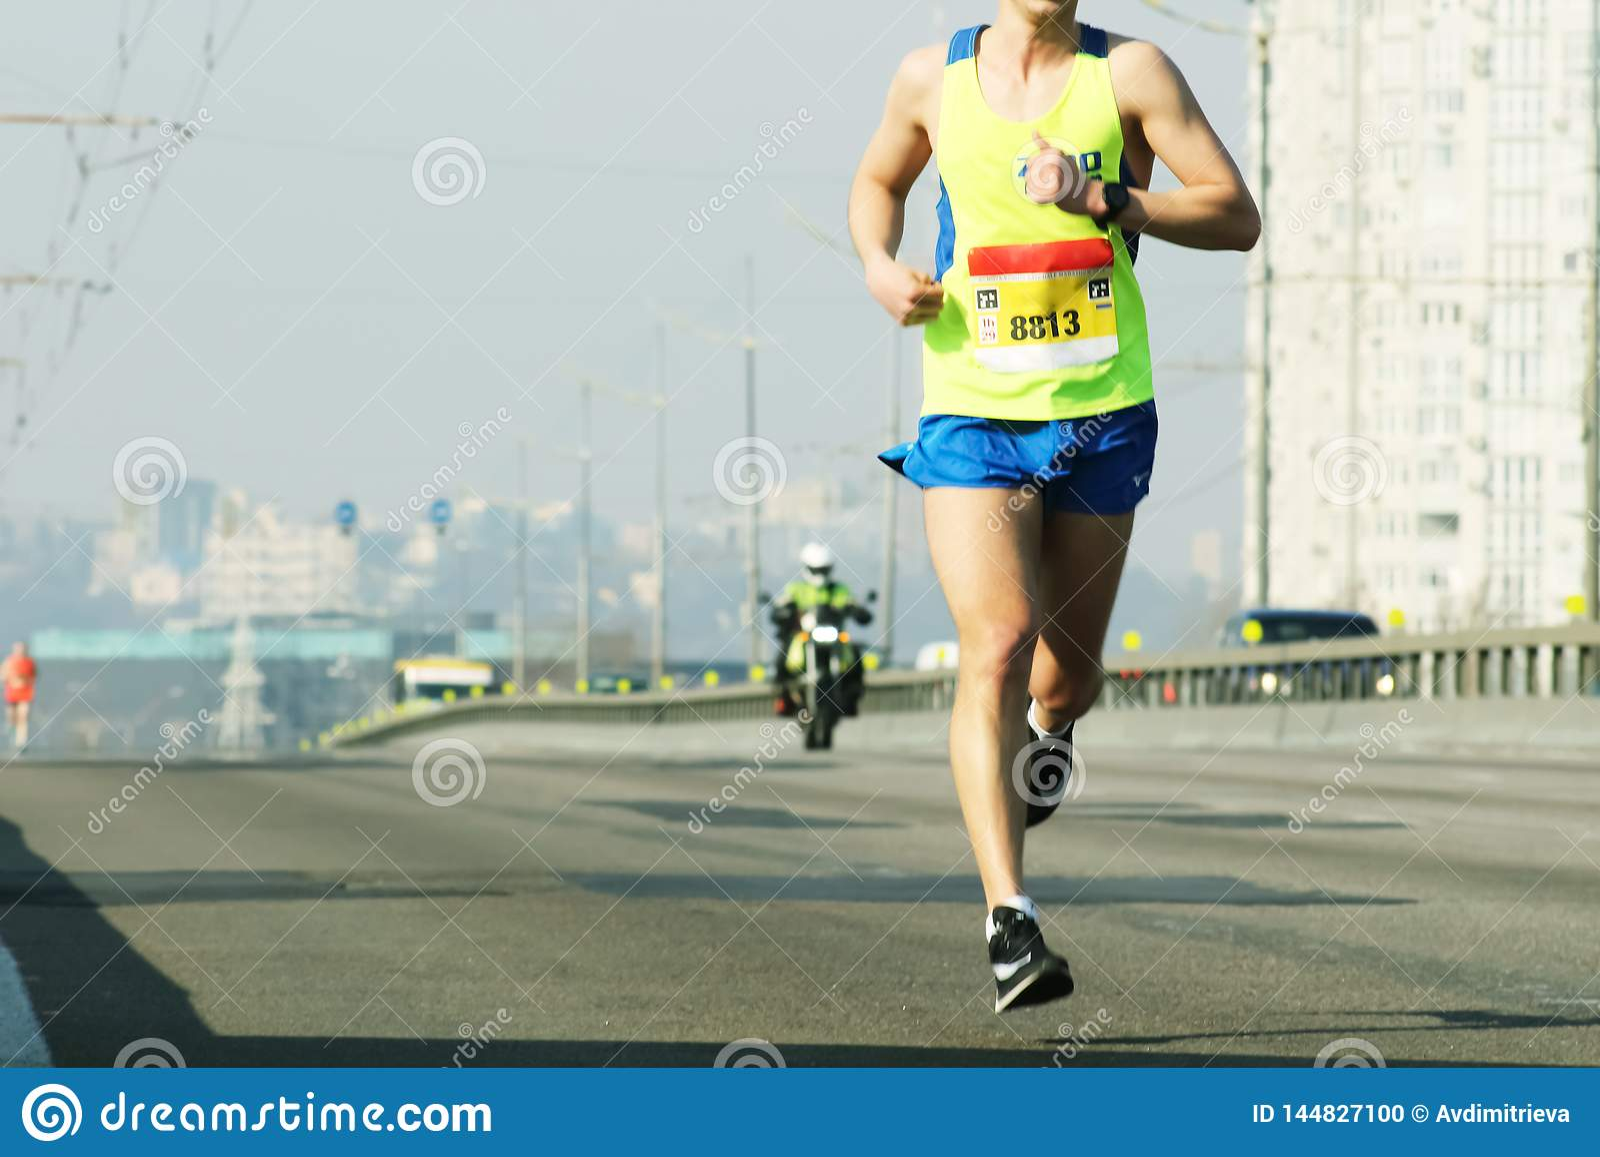 Maratonspring i morgonljuset K?ra p? stadsv?gen K?ra f?r idrottsman nenl?parefot L?parespring f?r ung kvinna p? stad